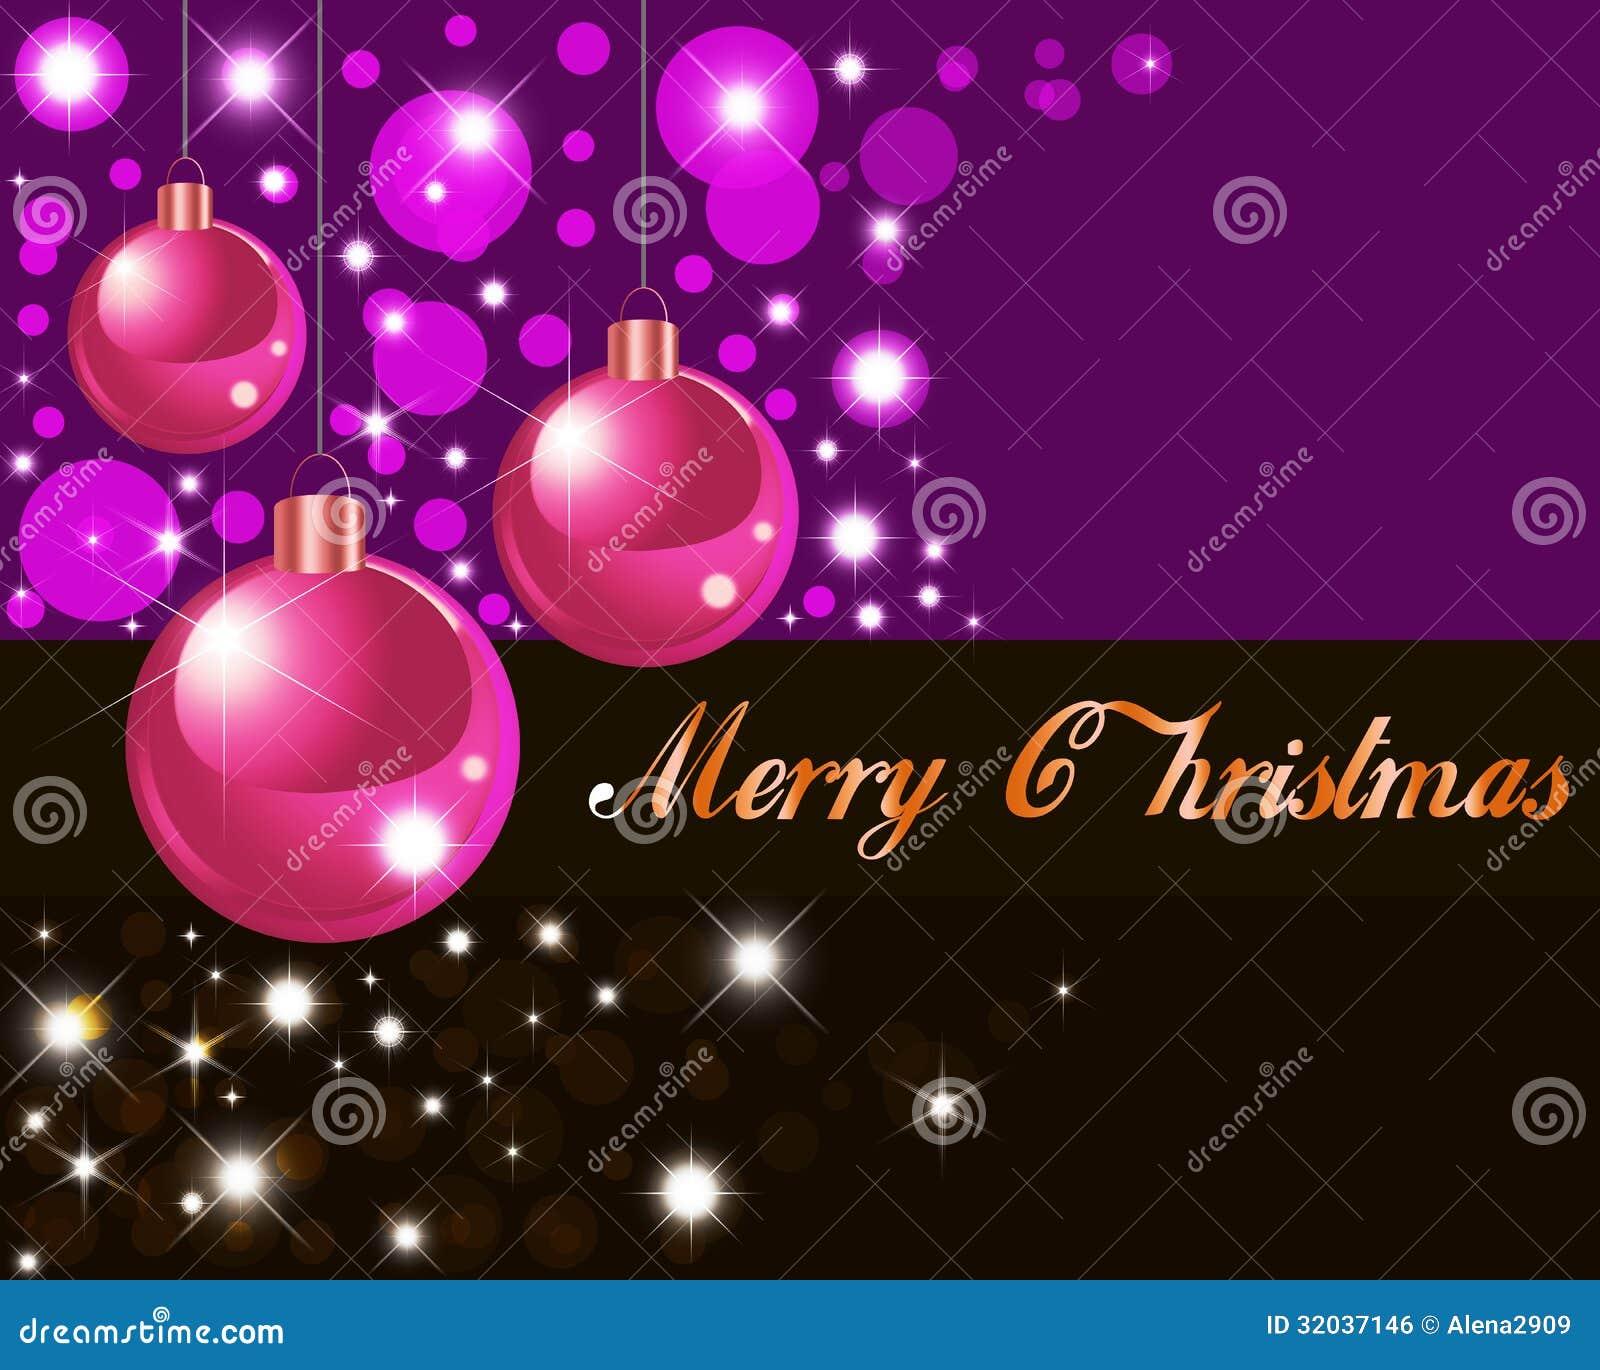 Greeting christmas card 2015 stock illustration illustration of greeting christmas card 2015 m4hsunfo